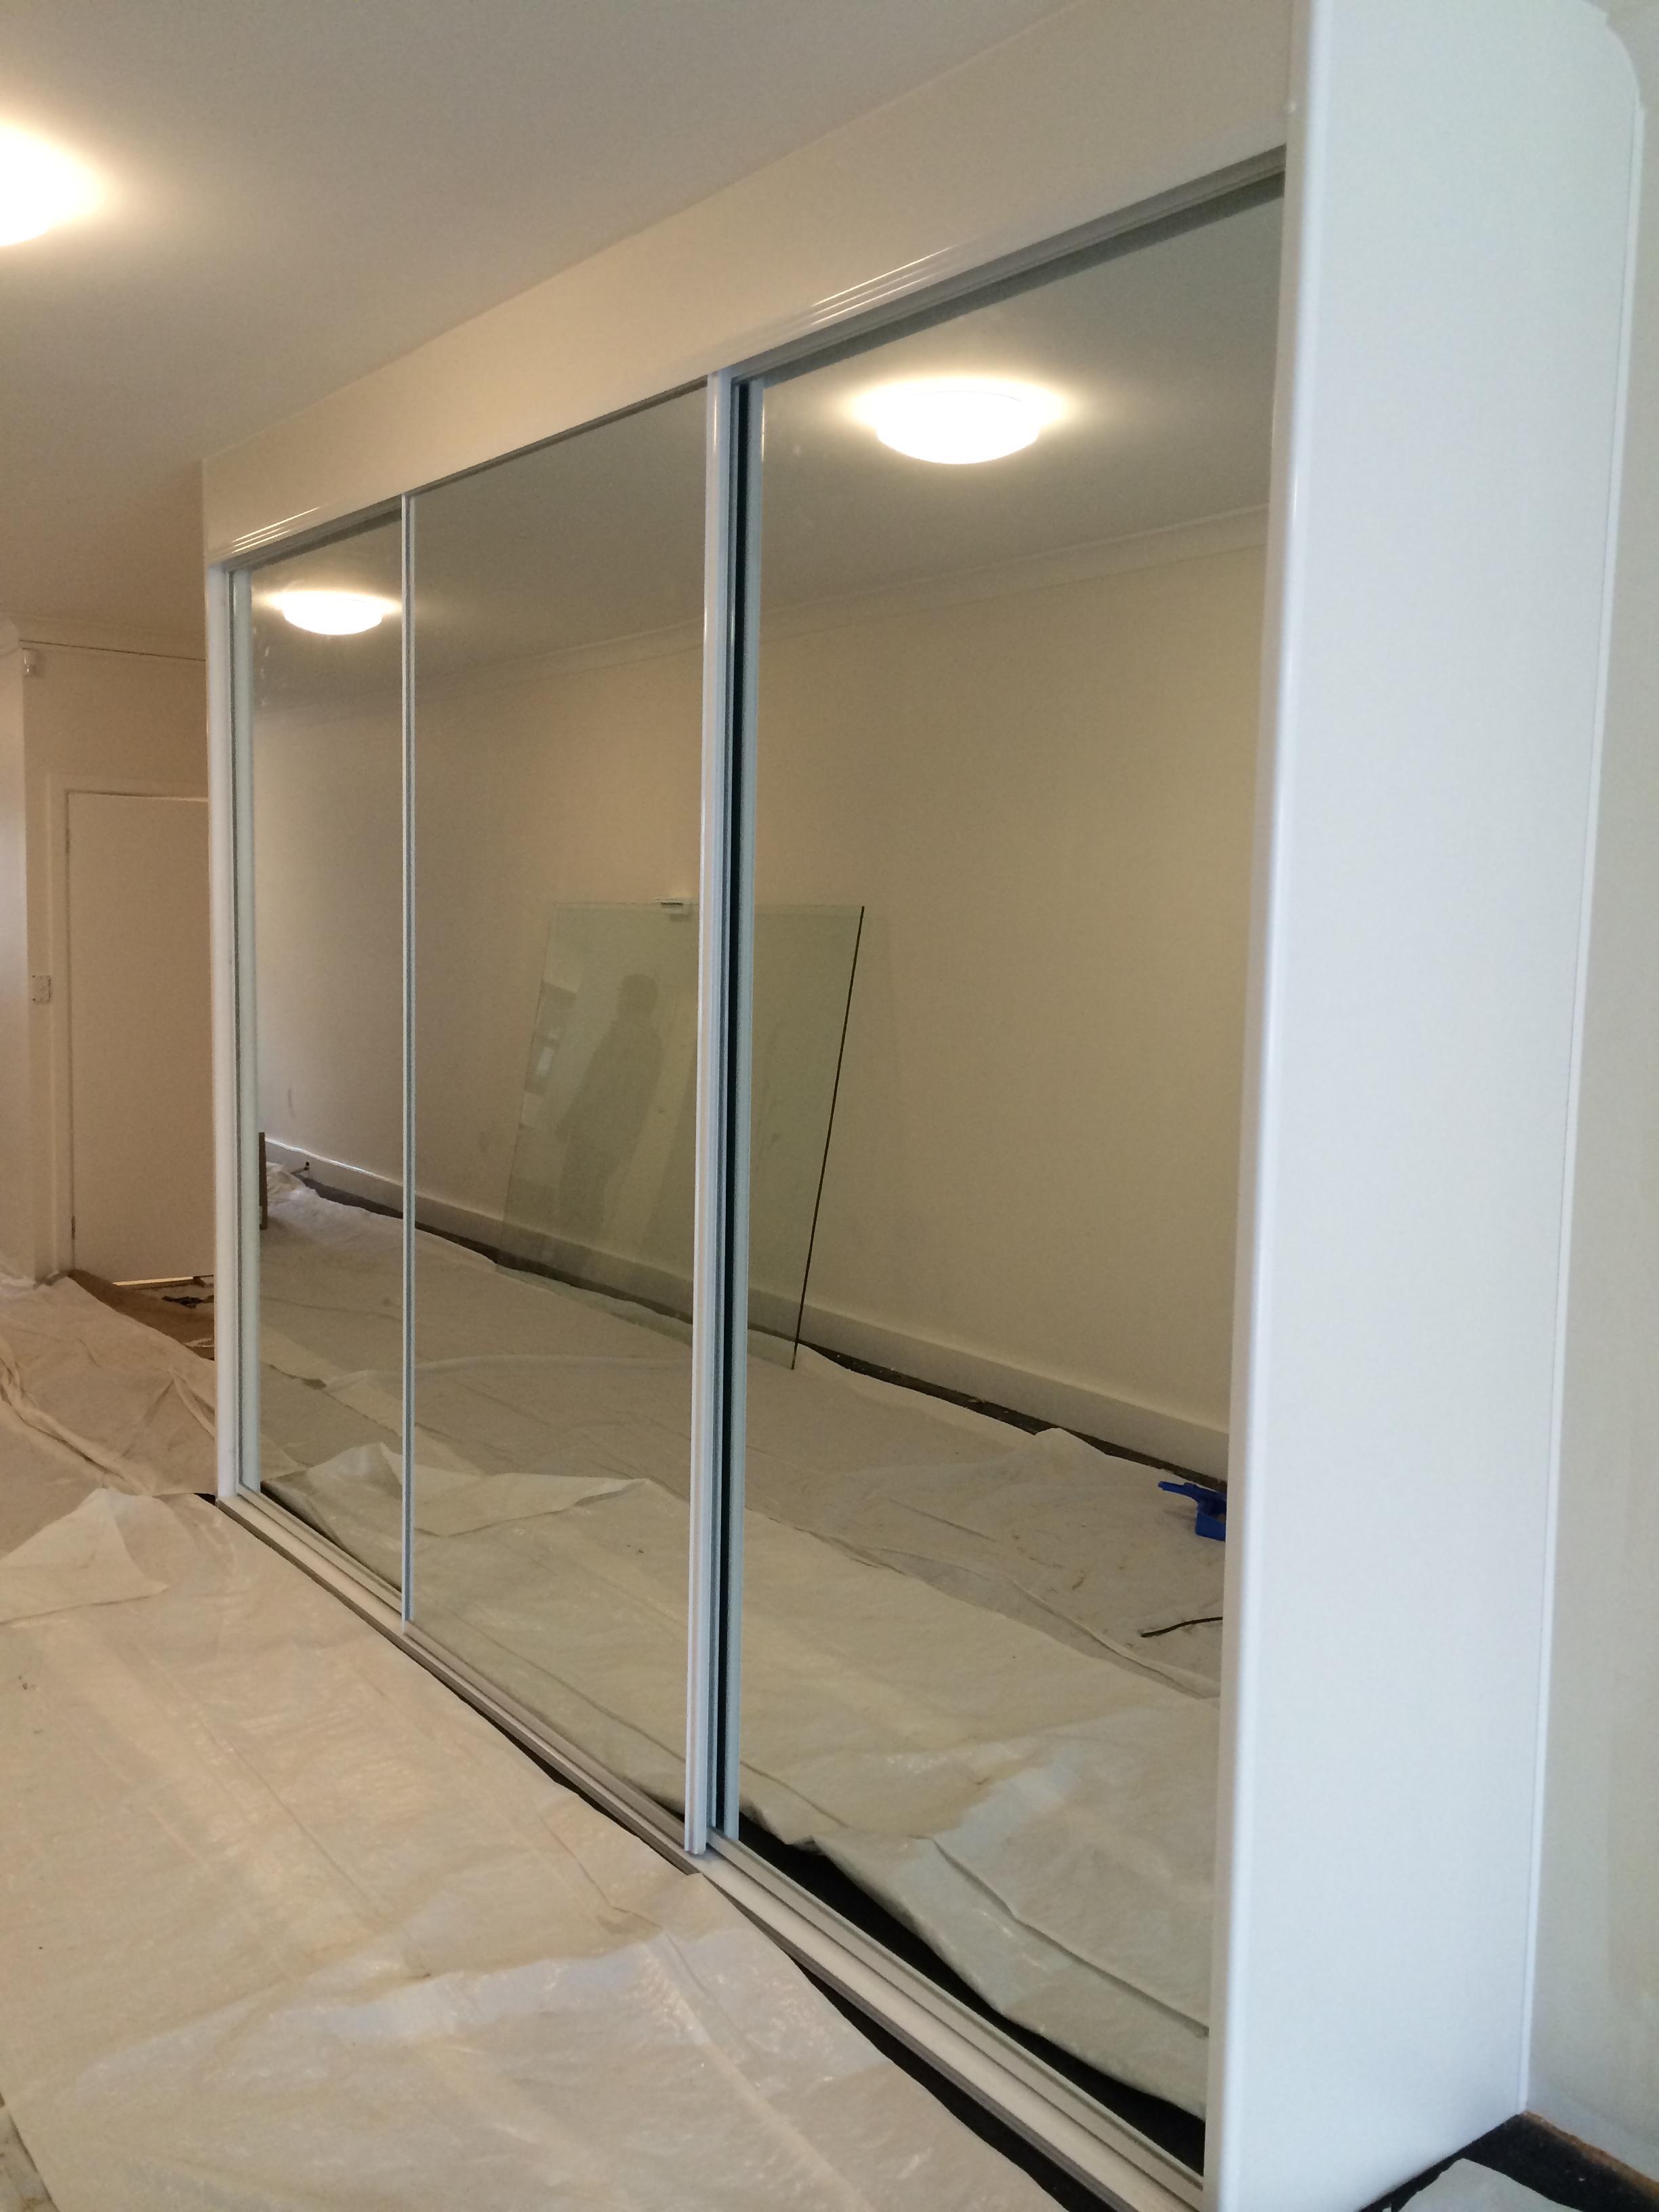 three door sliding mirror wardrobe with white frame.JPG